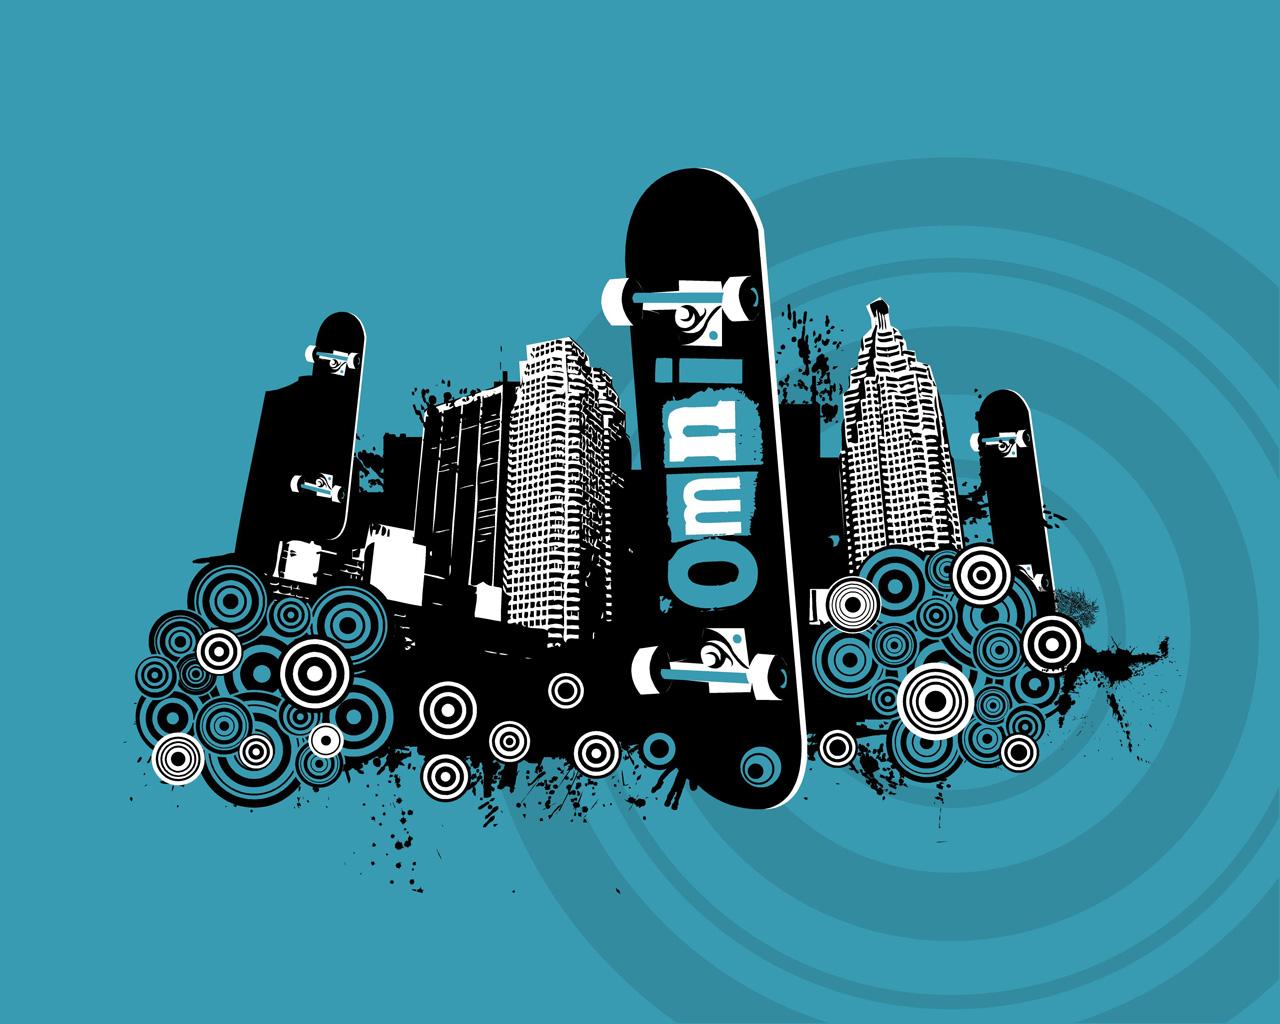 trololo blogg: Flip Wallpaper Skate